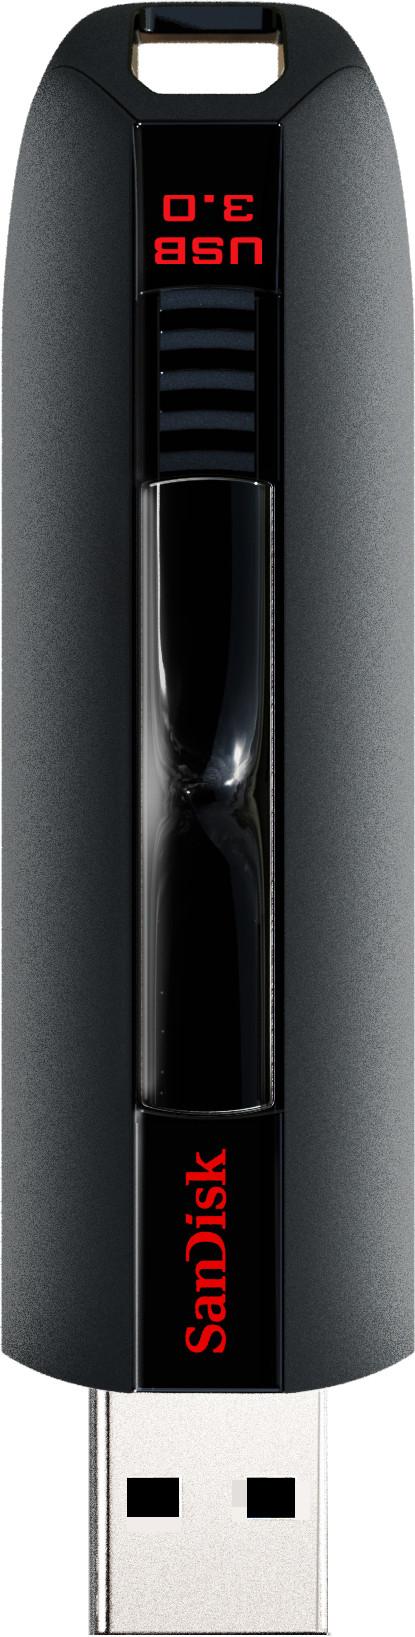 Sandisk Extreme 64 GB Pen Drive(Black)